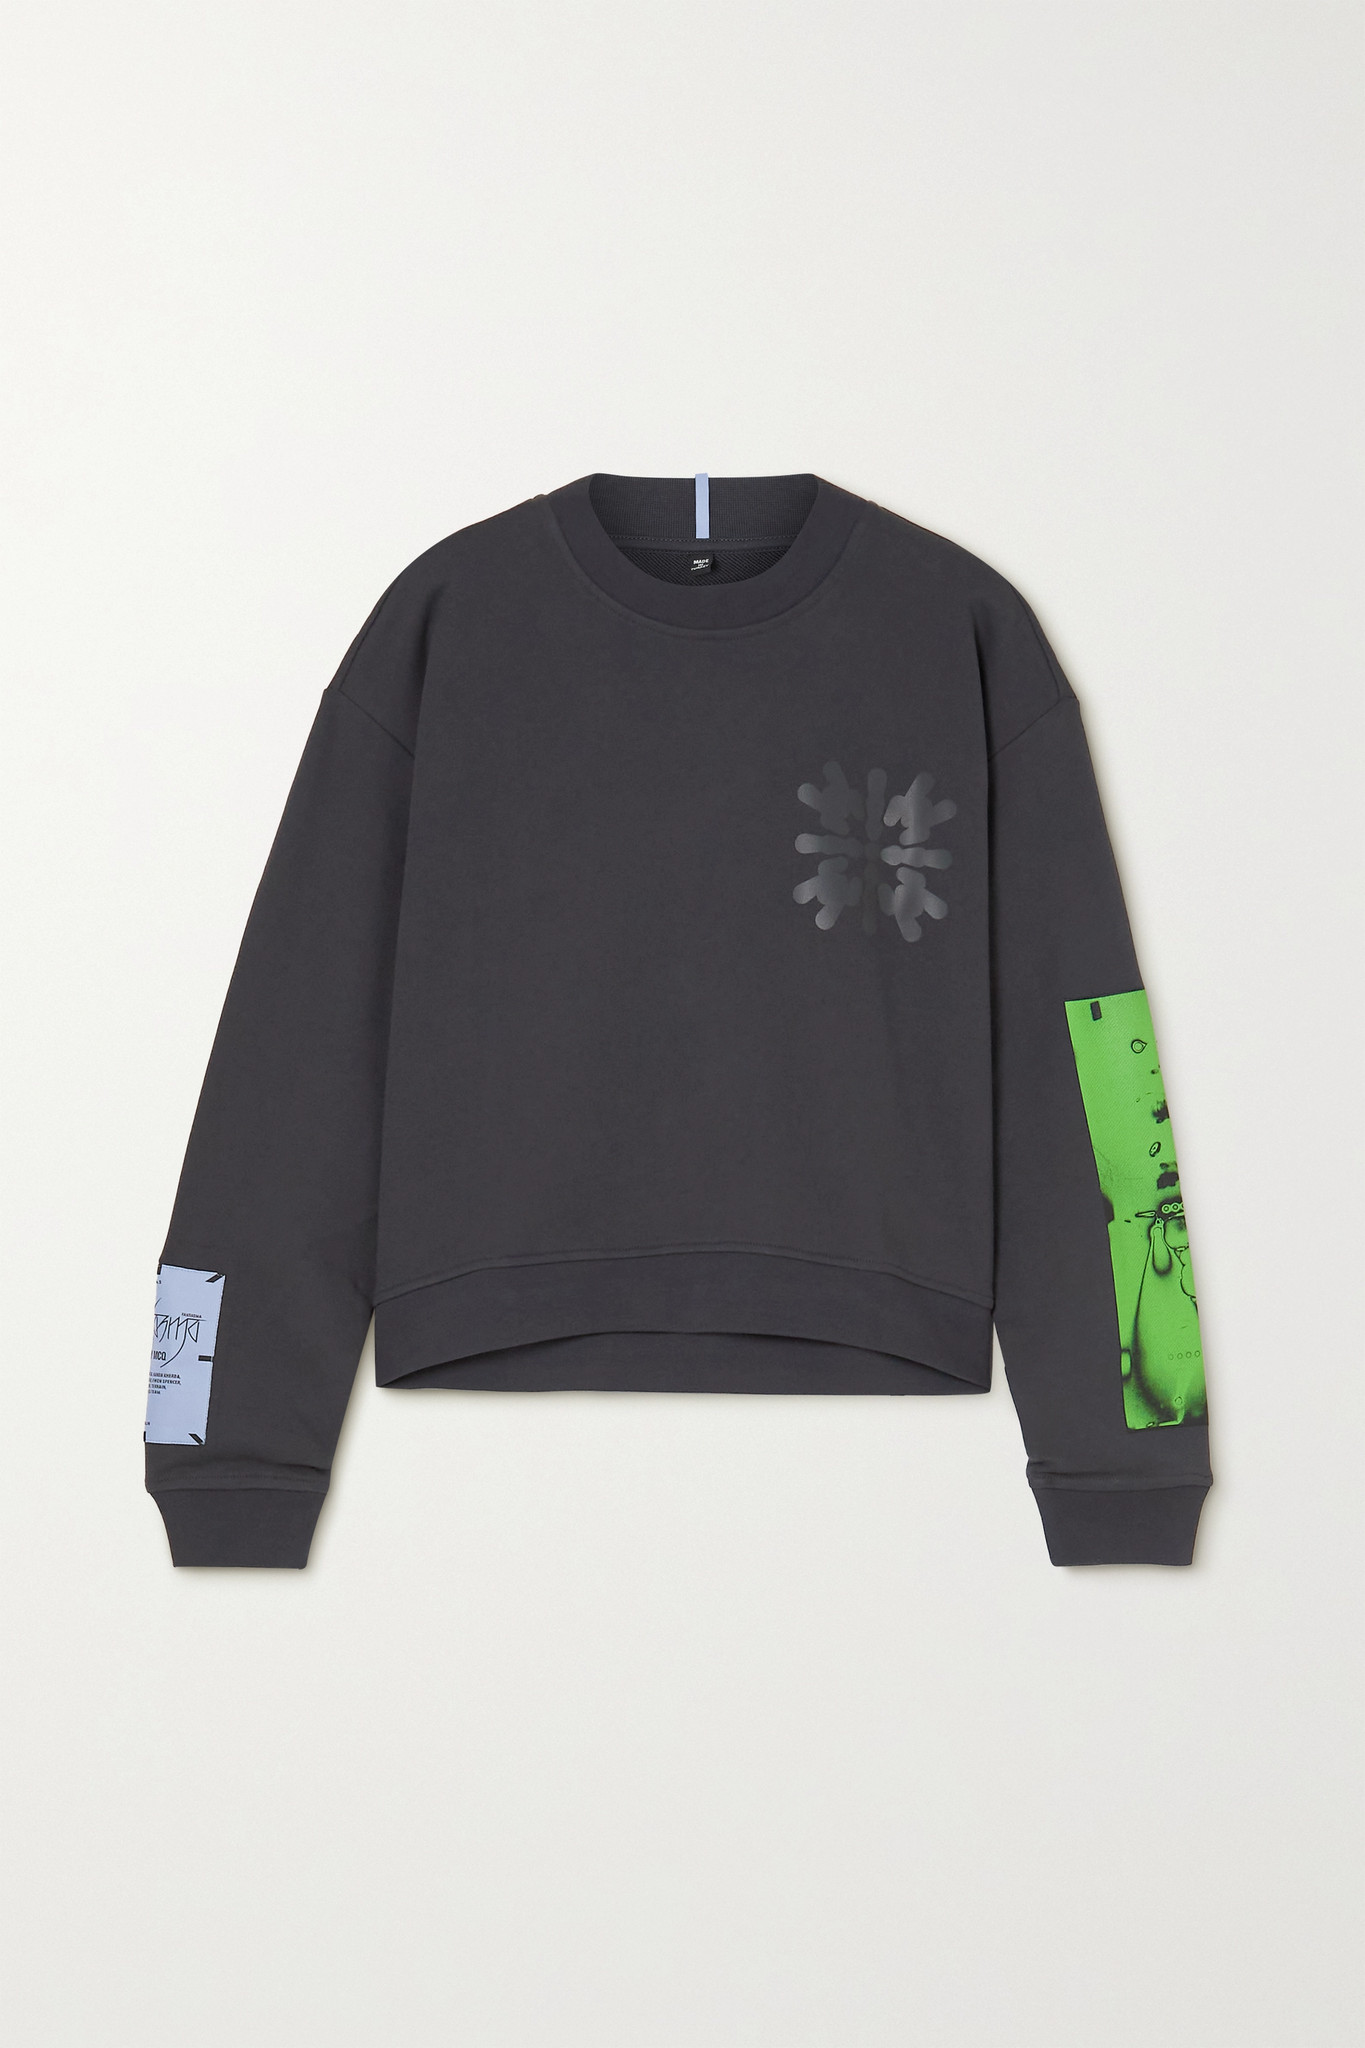 MCQ ALEXANDER MCQUEEN - Dance Appliquéd Printed Cotton-jersey Sweatshirt - Black - large